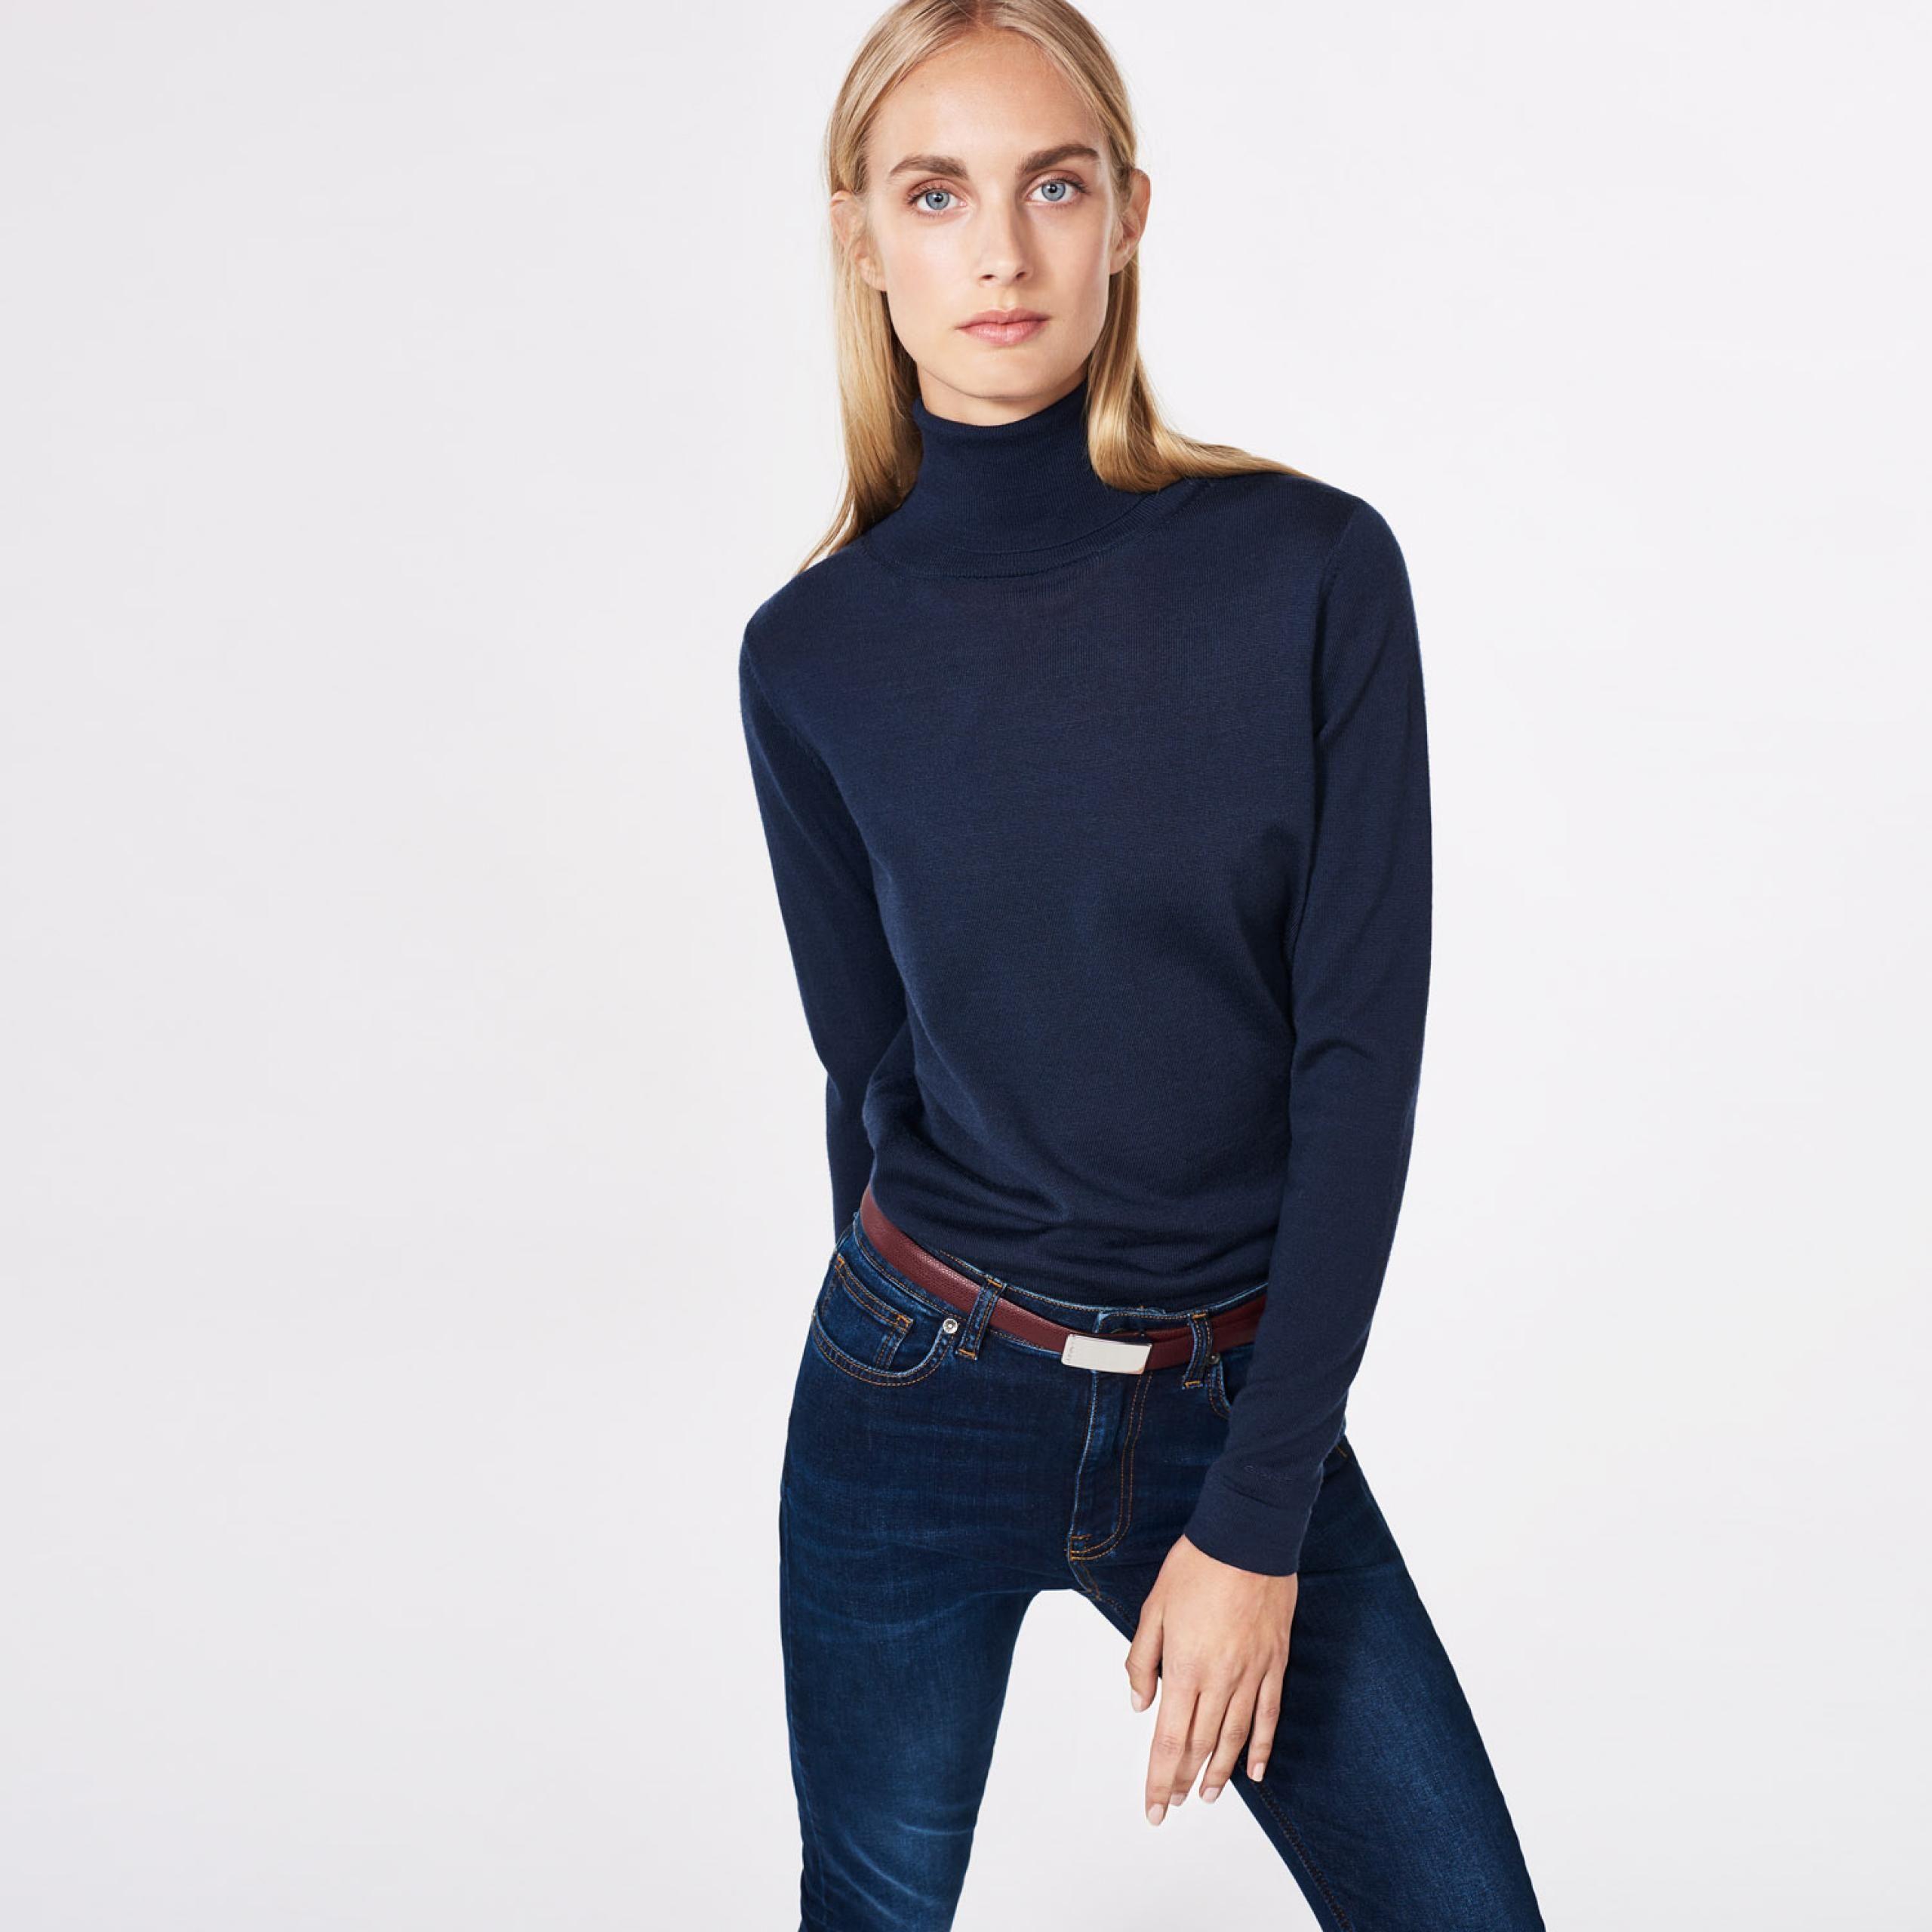 GANT - Merino Wool Turtleneck Sweater Marine til Dame | Officiel hjemmeside